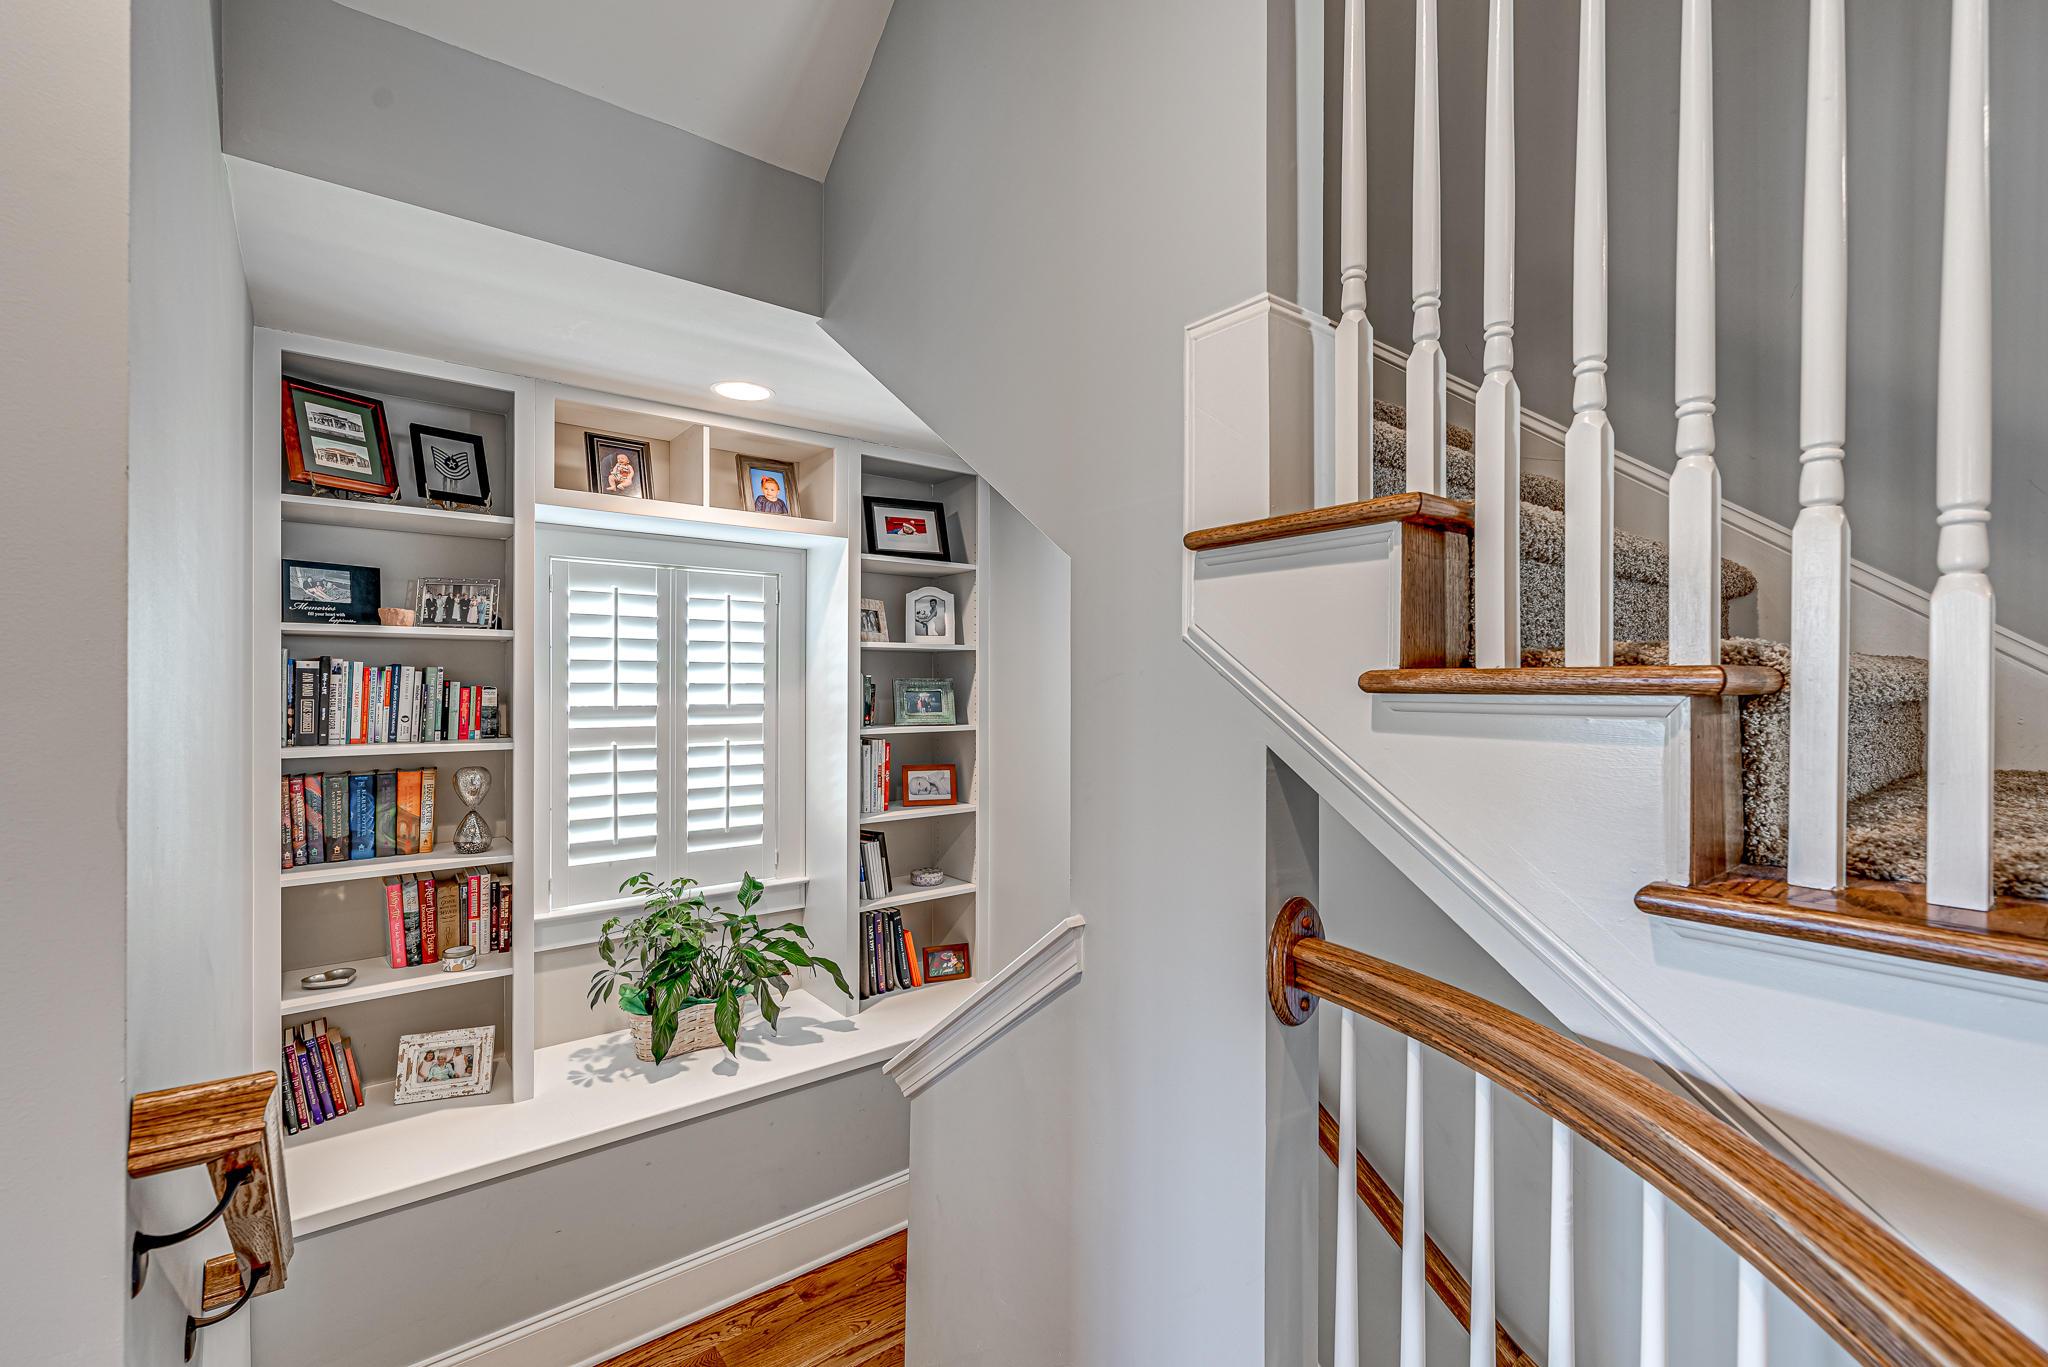 Daniel Island Smythe Park Homes For Sale - 1410 Wando View, Charleston, SC - 7